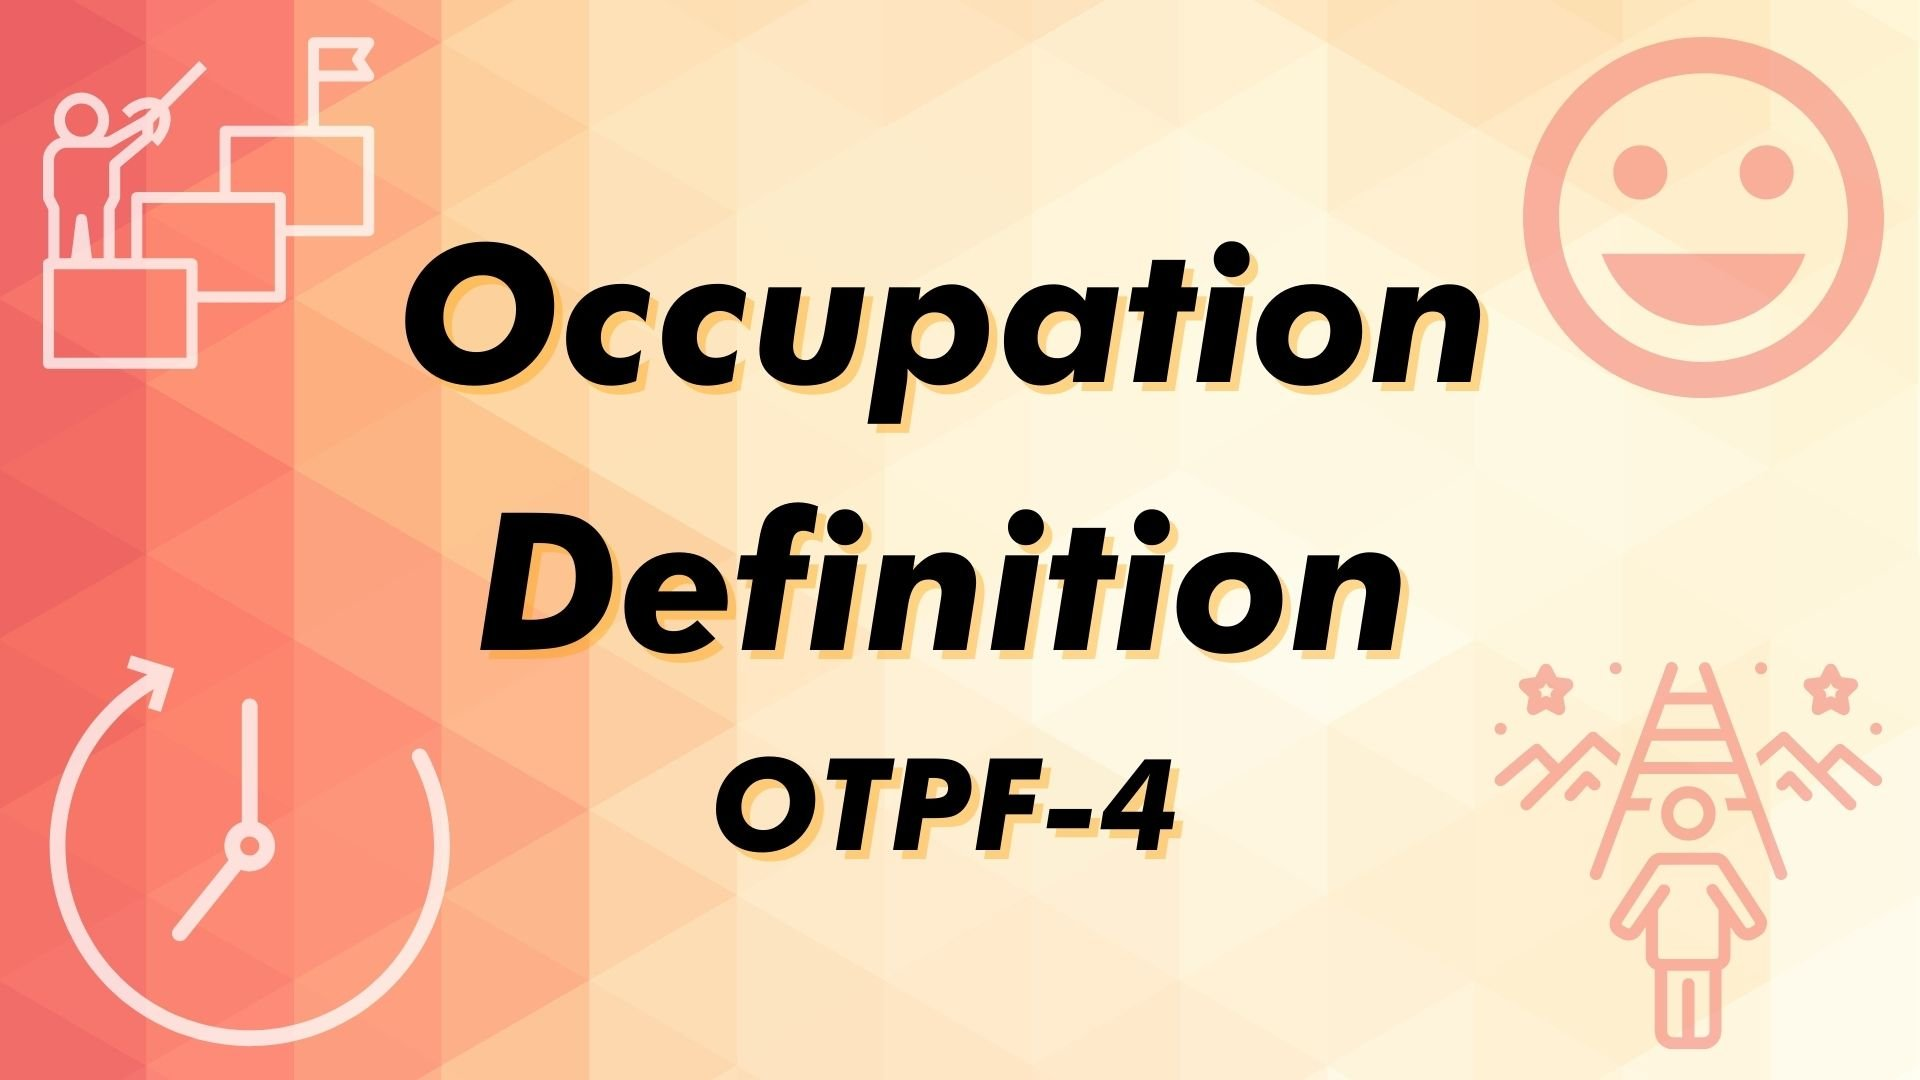 Occupation Definition OTPF-4